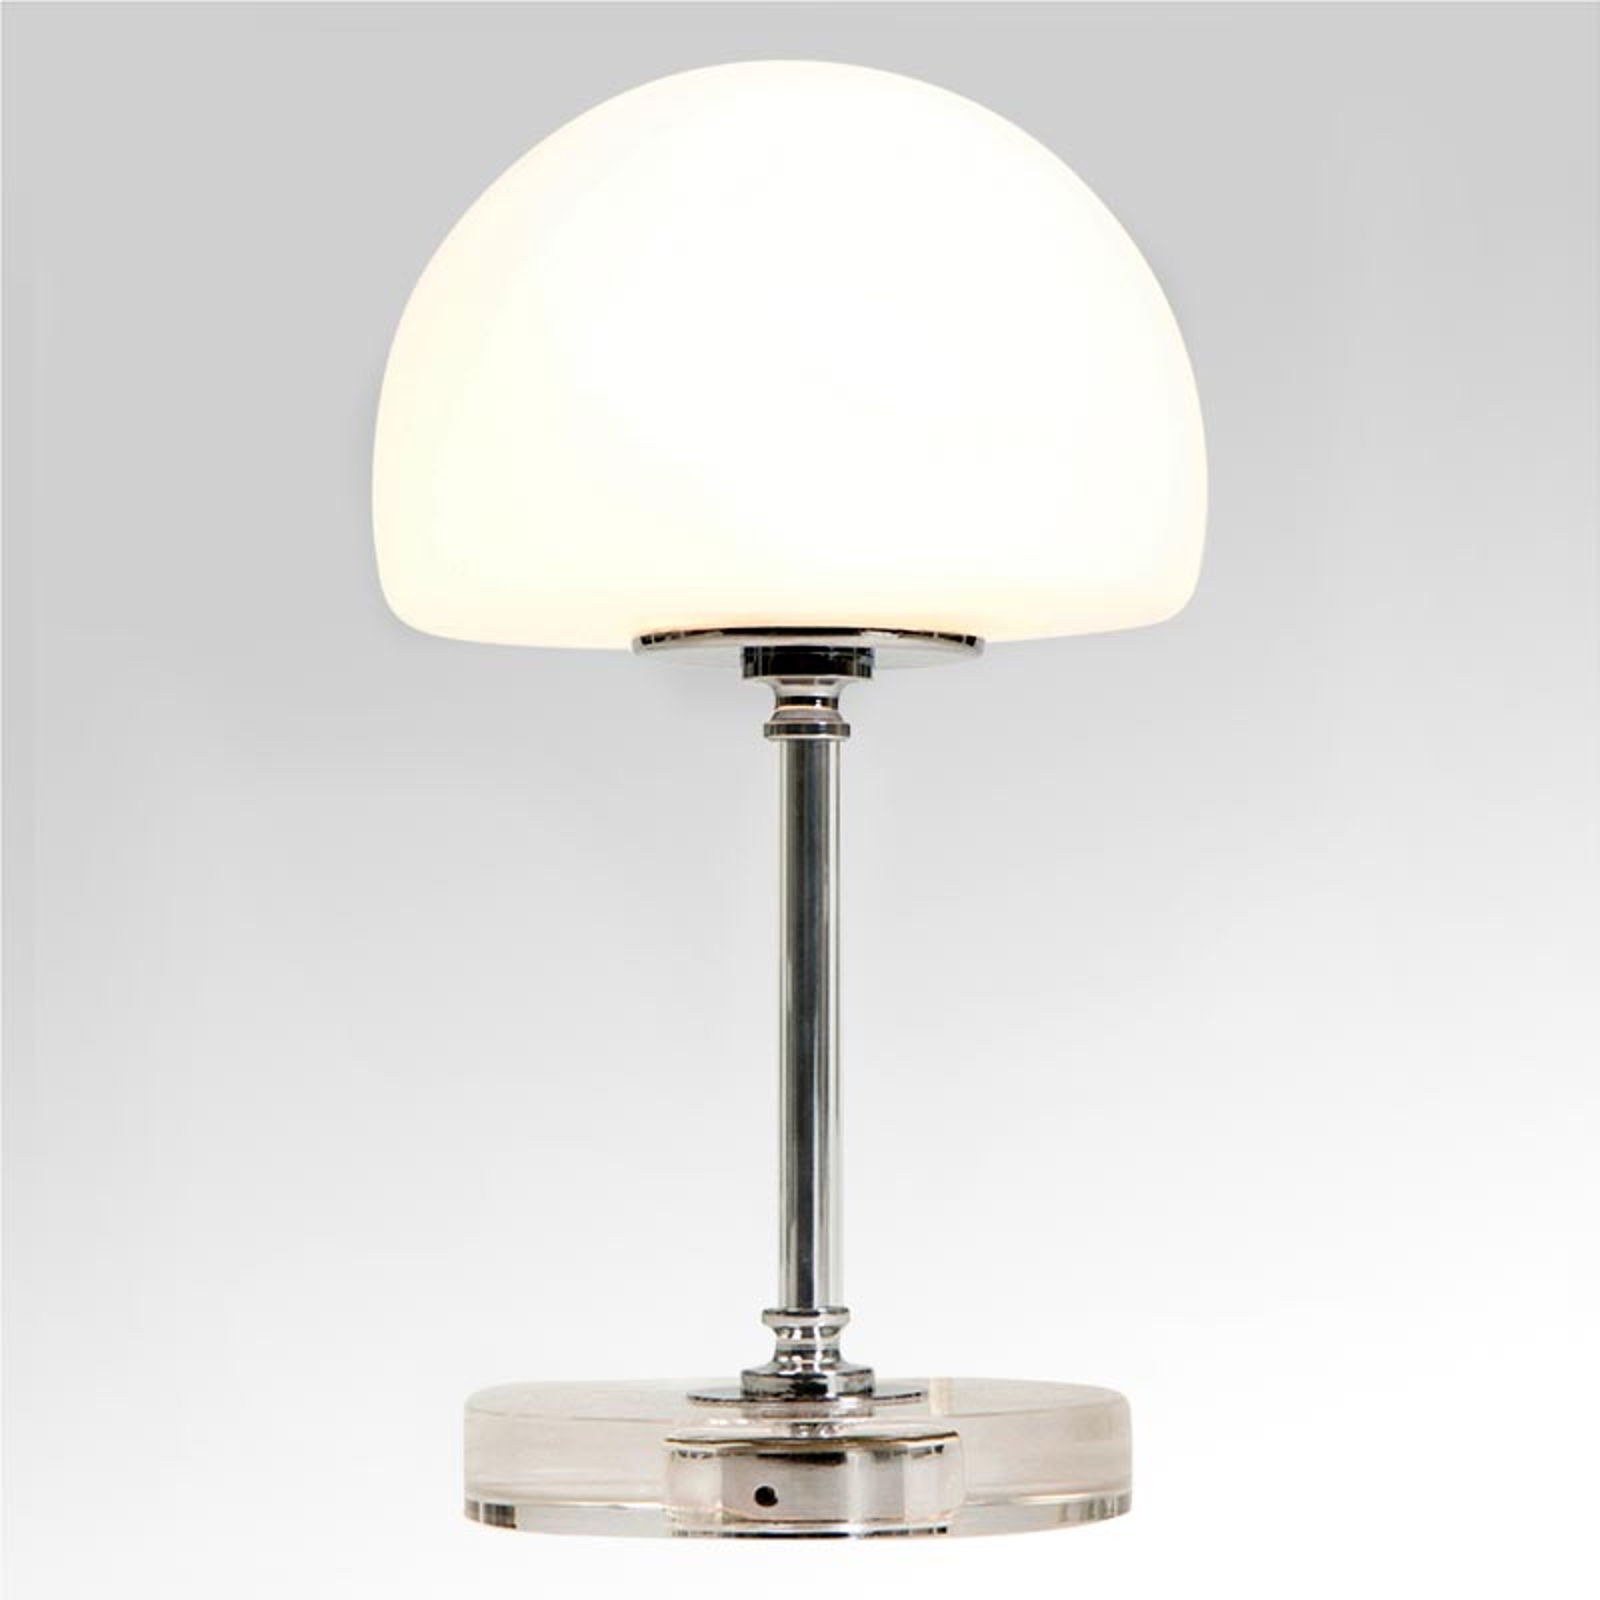 Ancilla - verchroomde LED tafellamp met dimmer